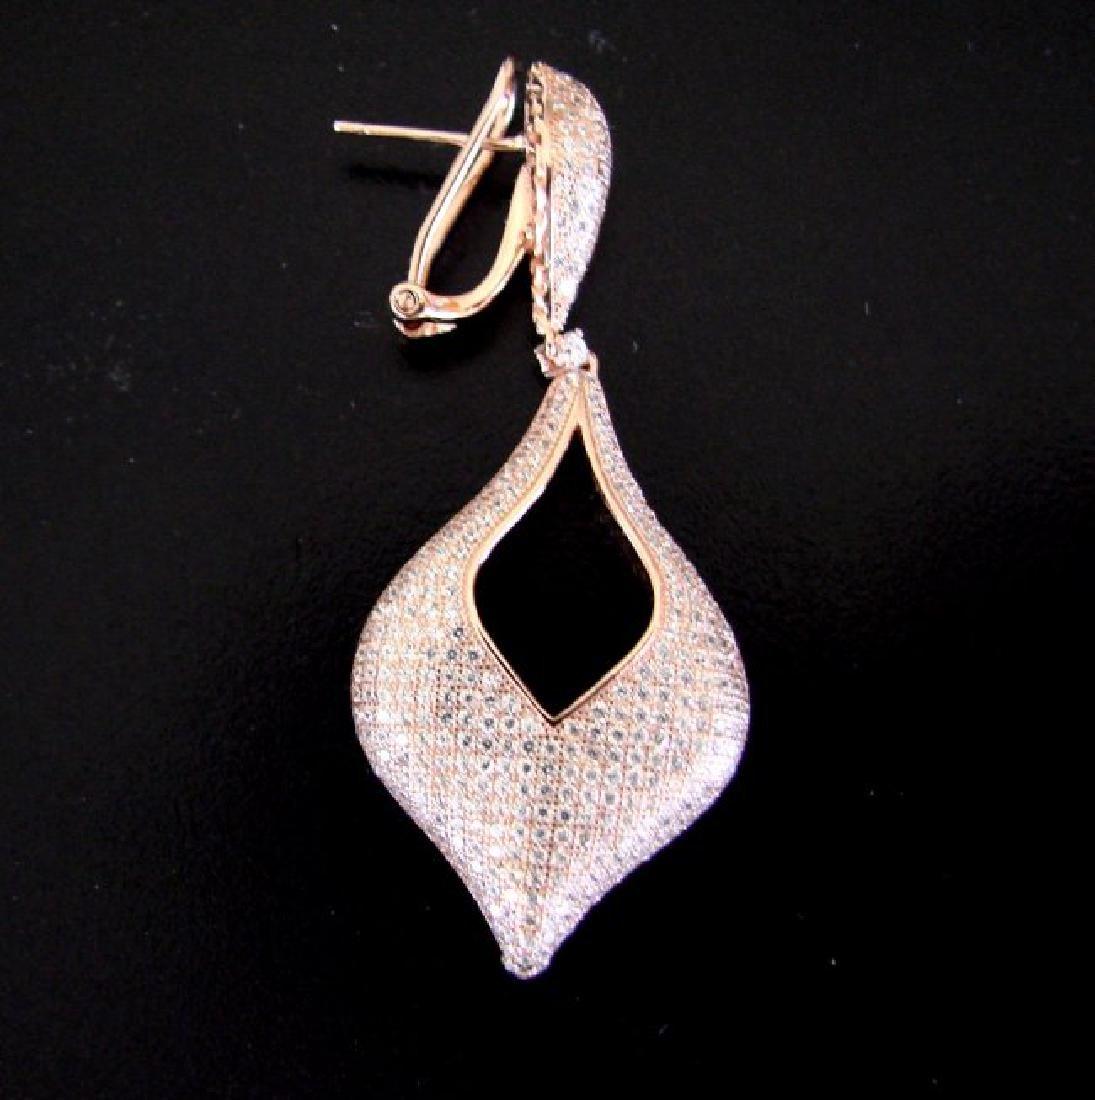 Creation Diamond Earrings 6.17Ct 18k R/g Overlay - 3